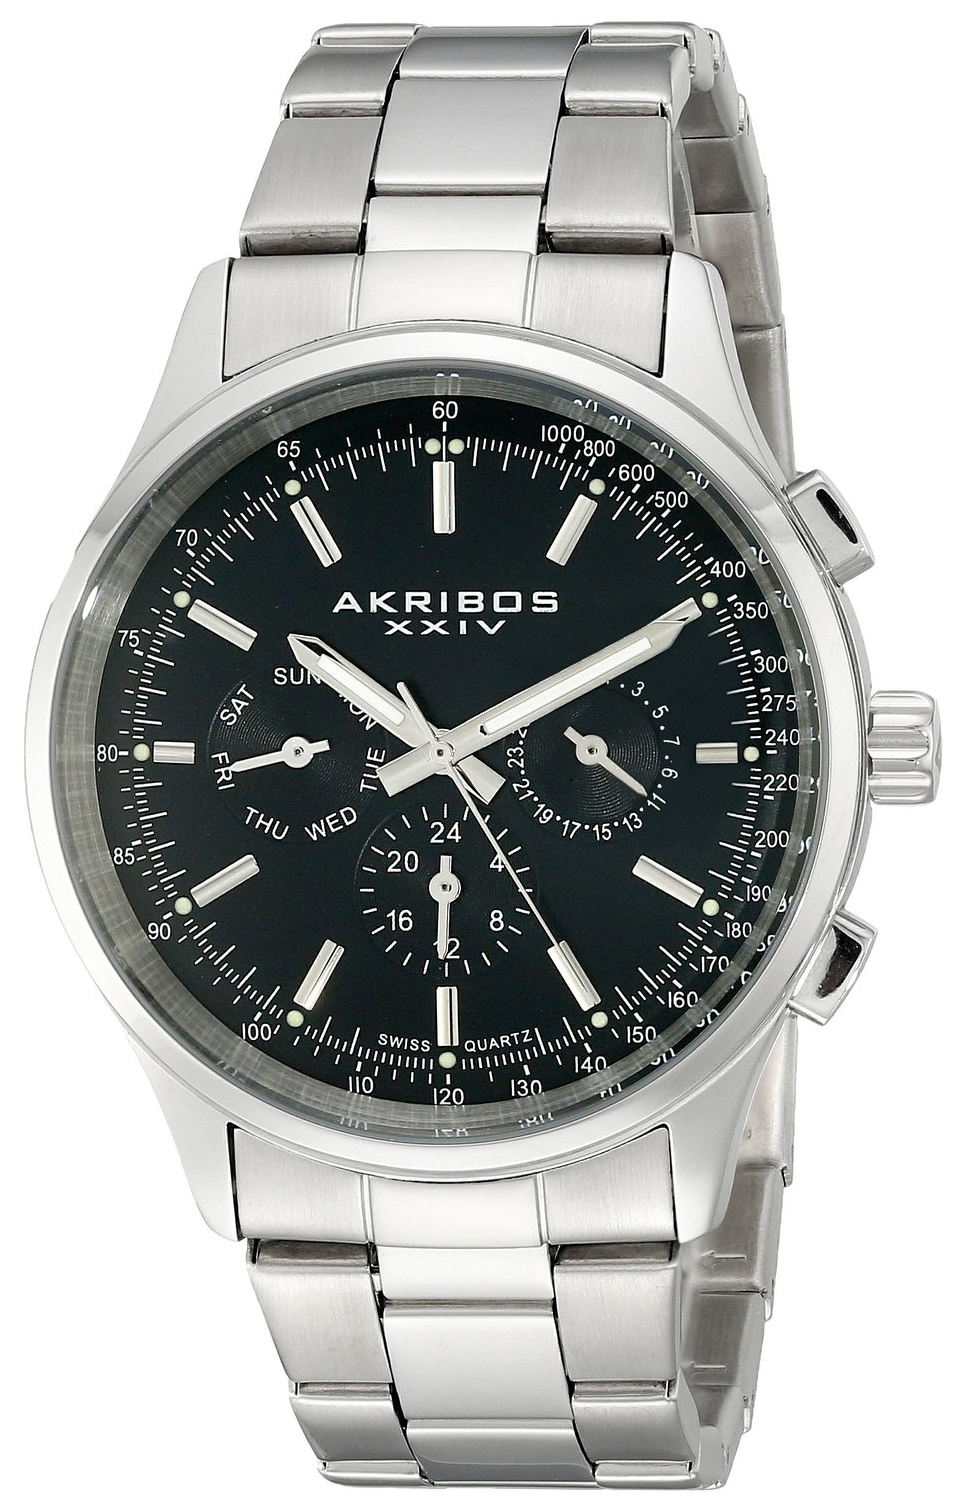 Akribos XXIV 99999 Herrklocka AK788SSB Svart/Stål Ø43 mm - Akribos XXIV